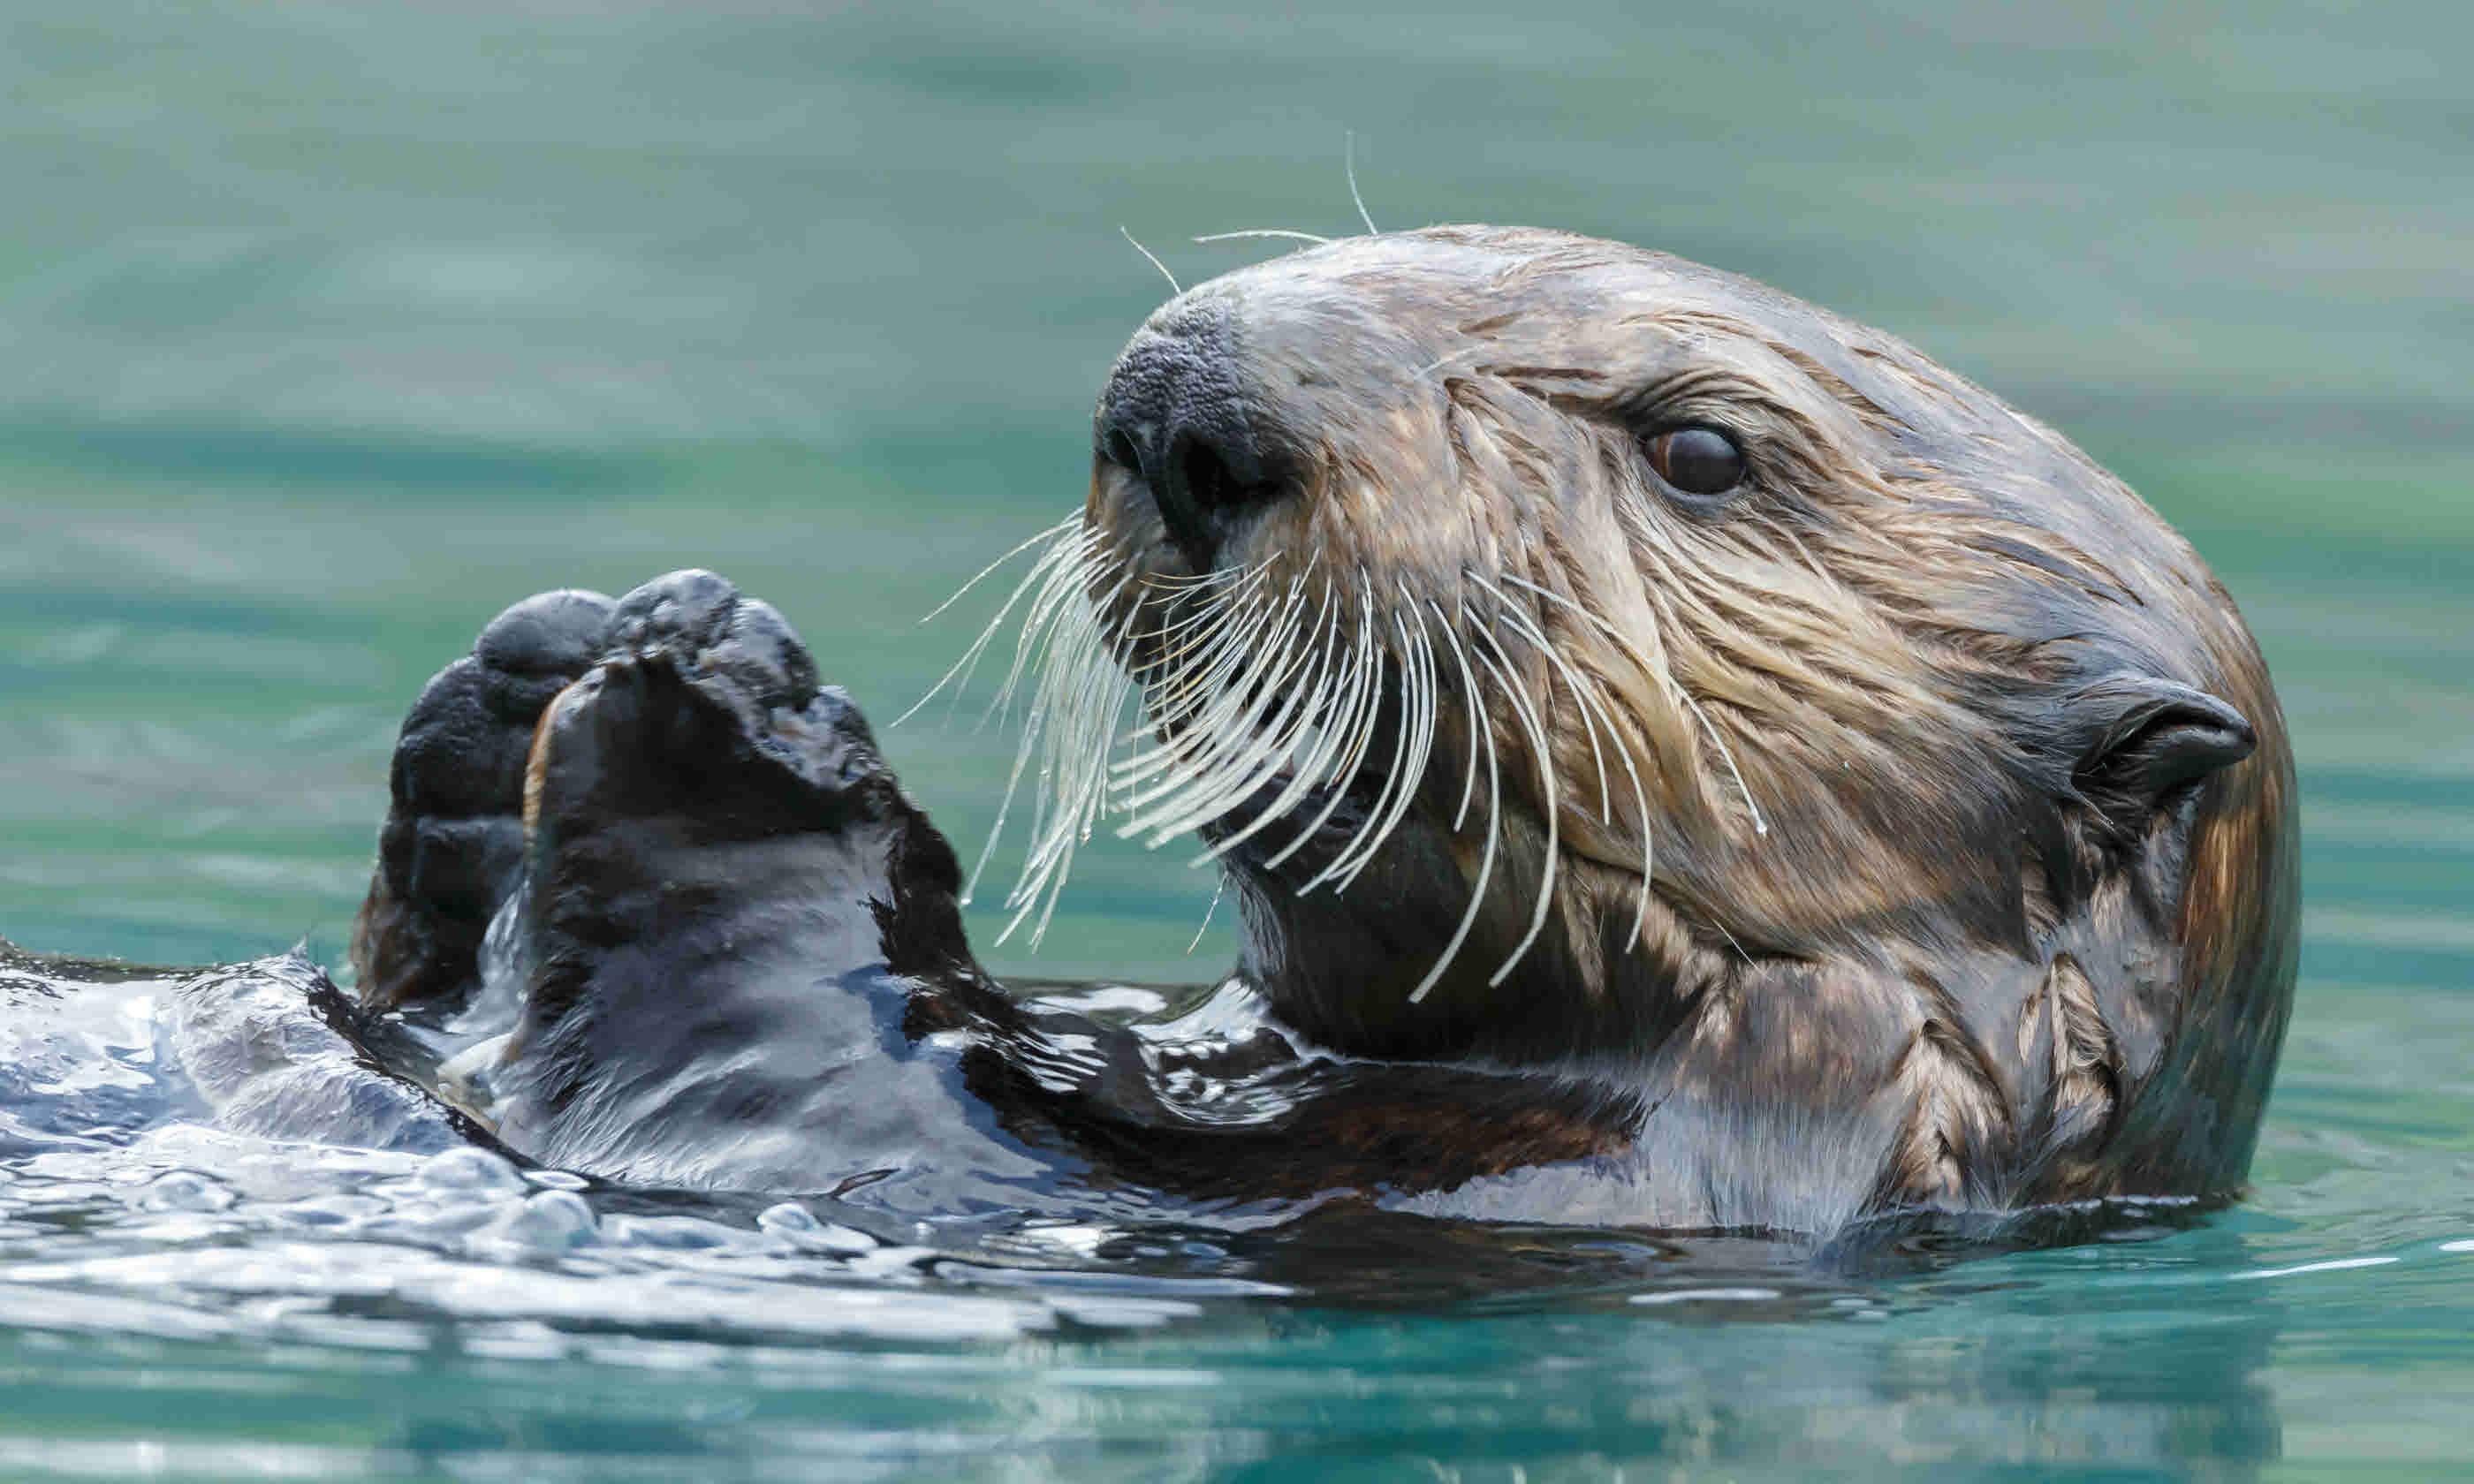 Sea otter (Shutterstock)